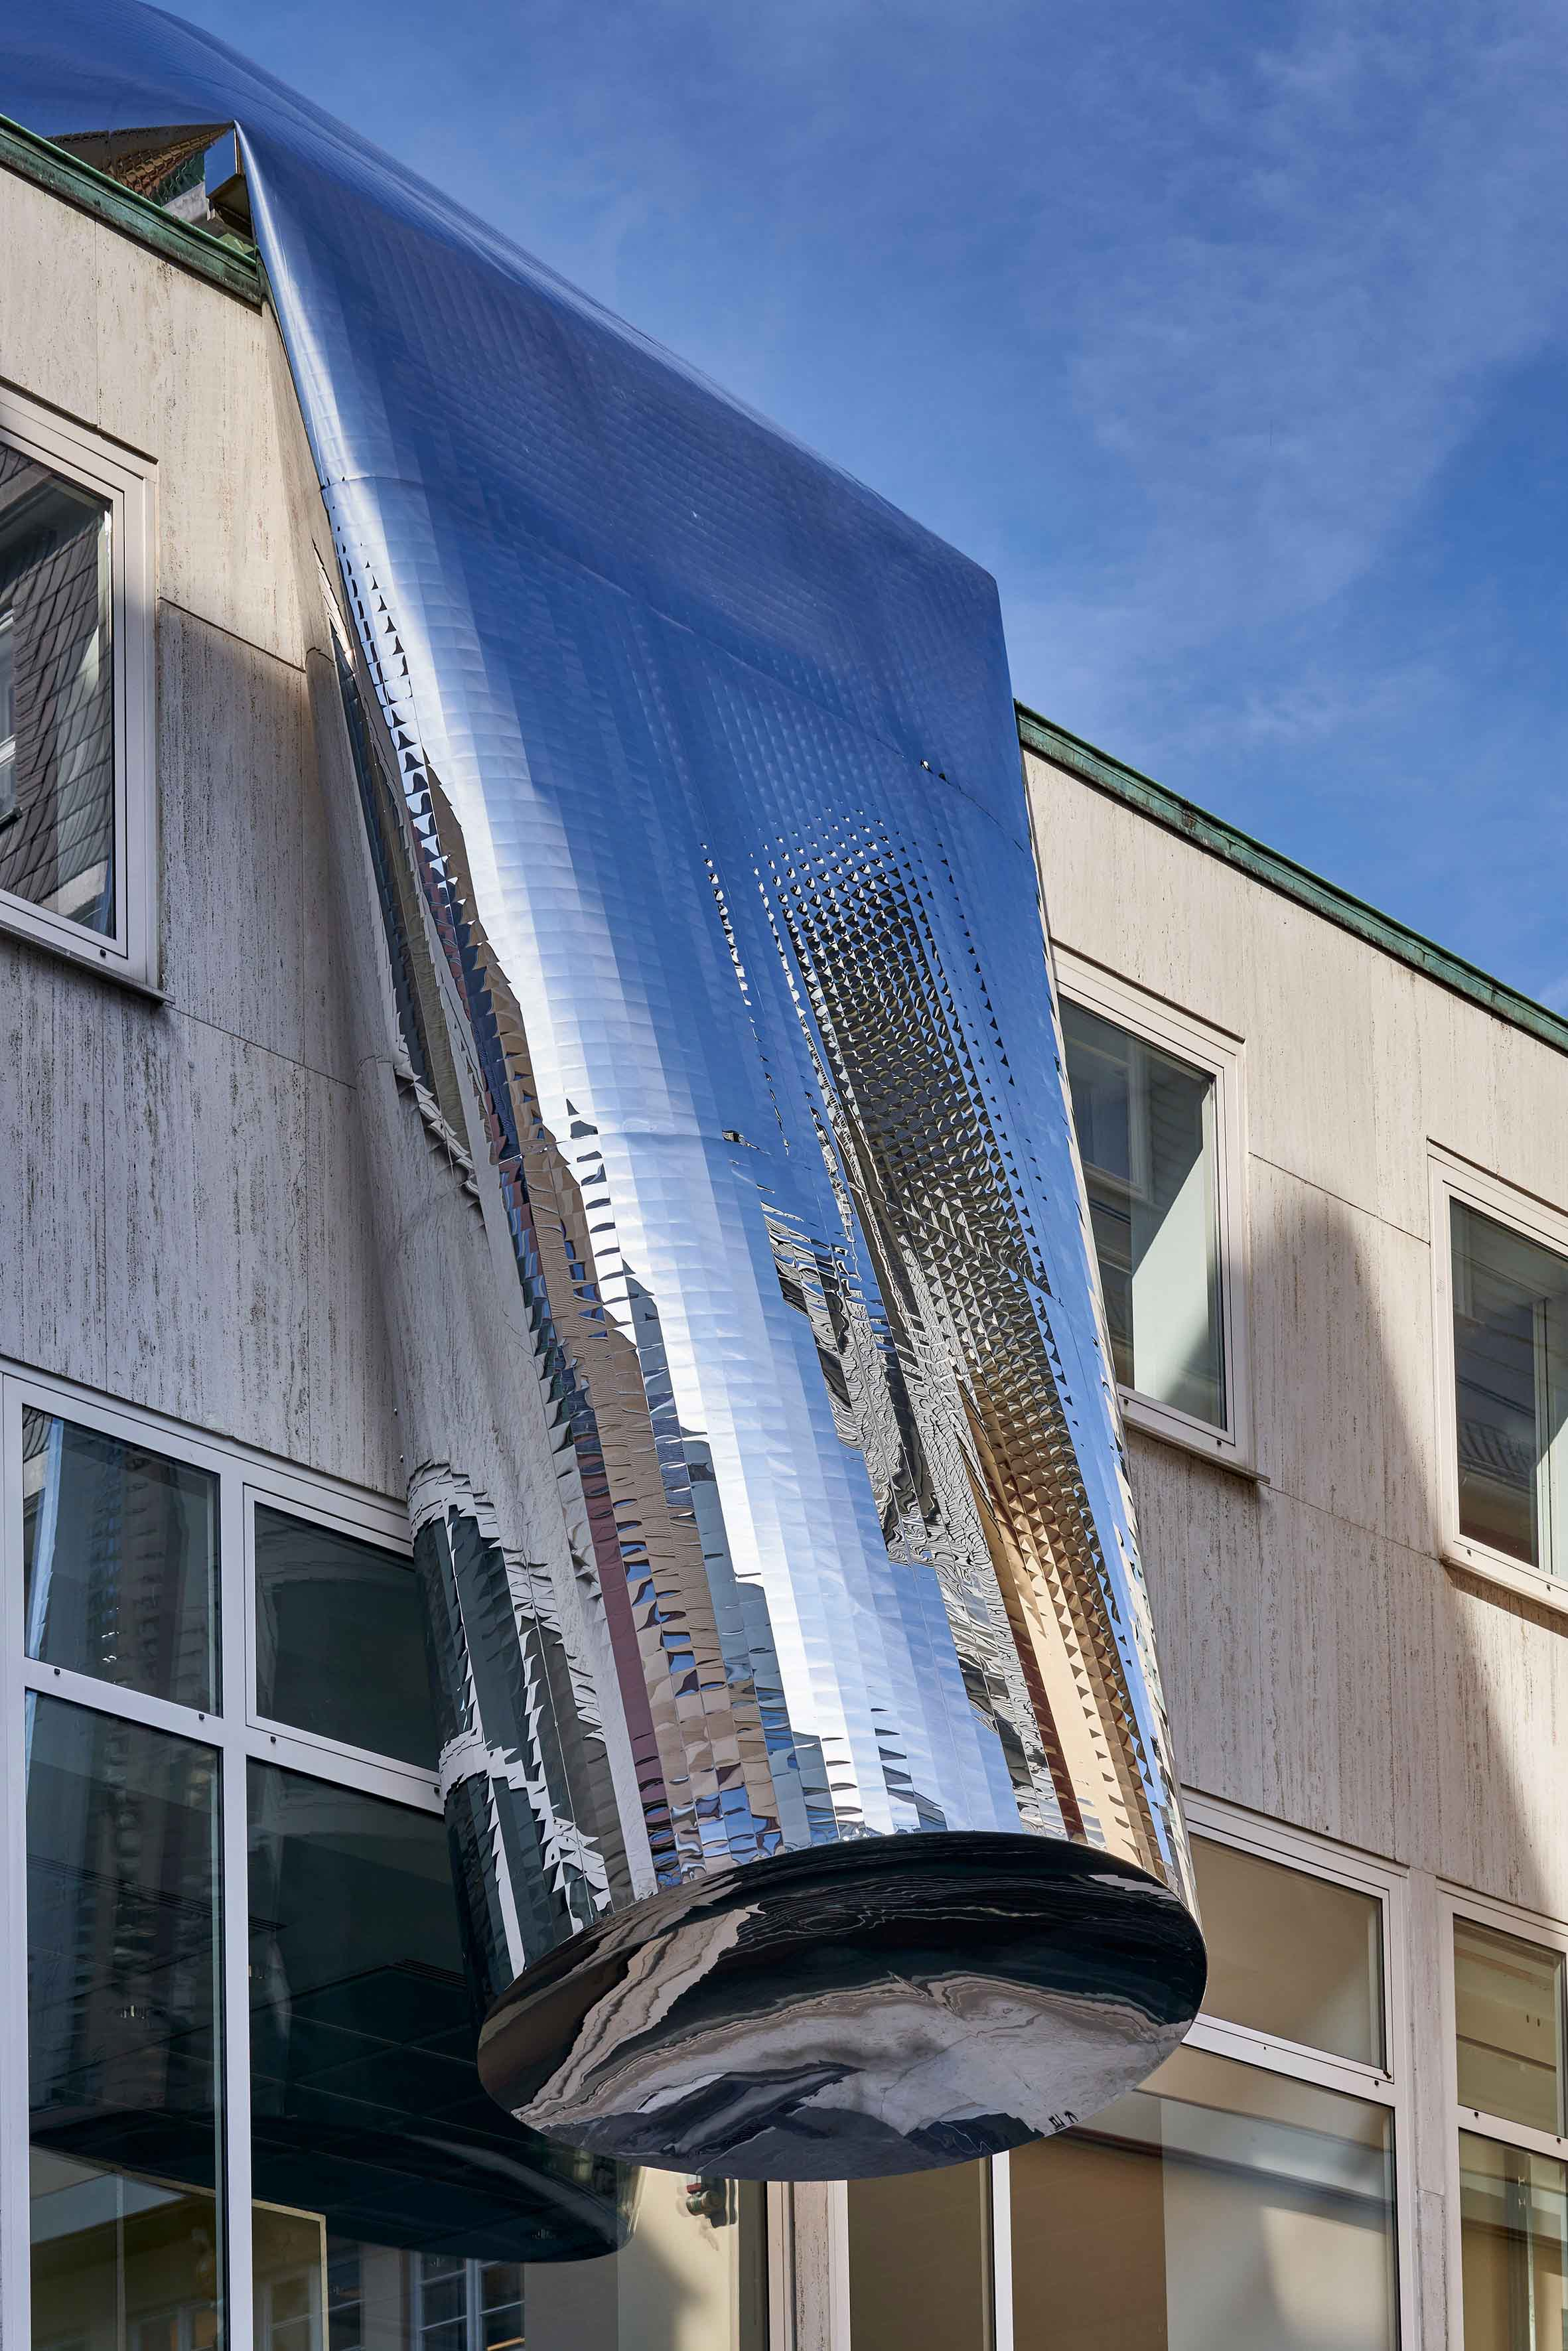 FKV_WinterHoerbelt_Die Grosse Illusion_photo:Norbert Miguletz@Frankfurter Kunstverein